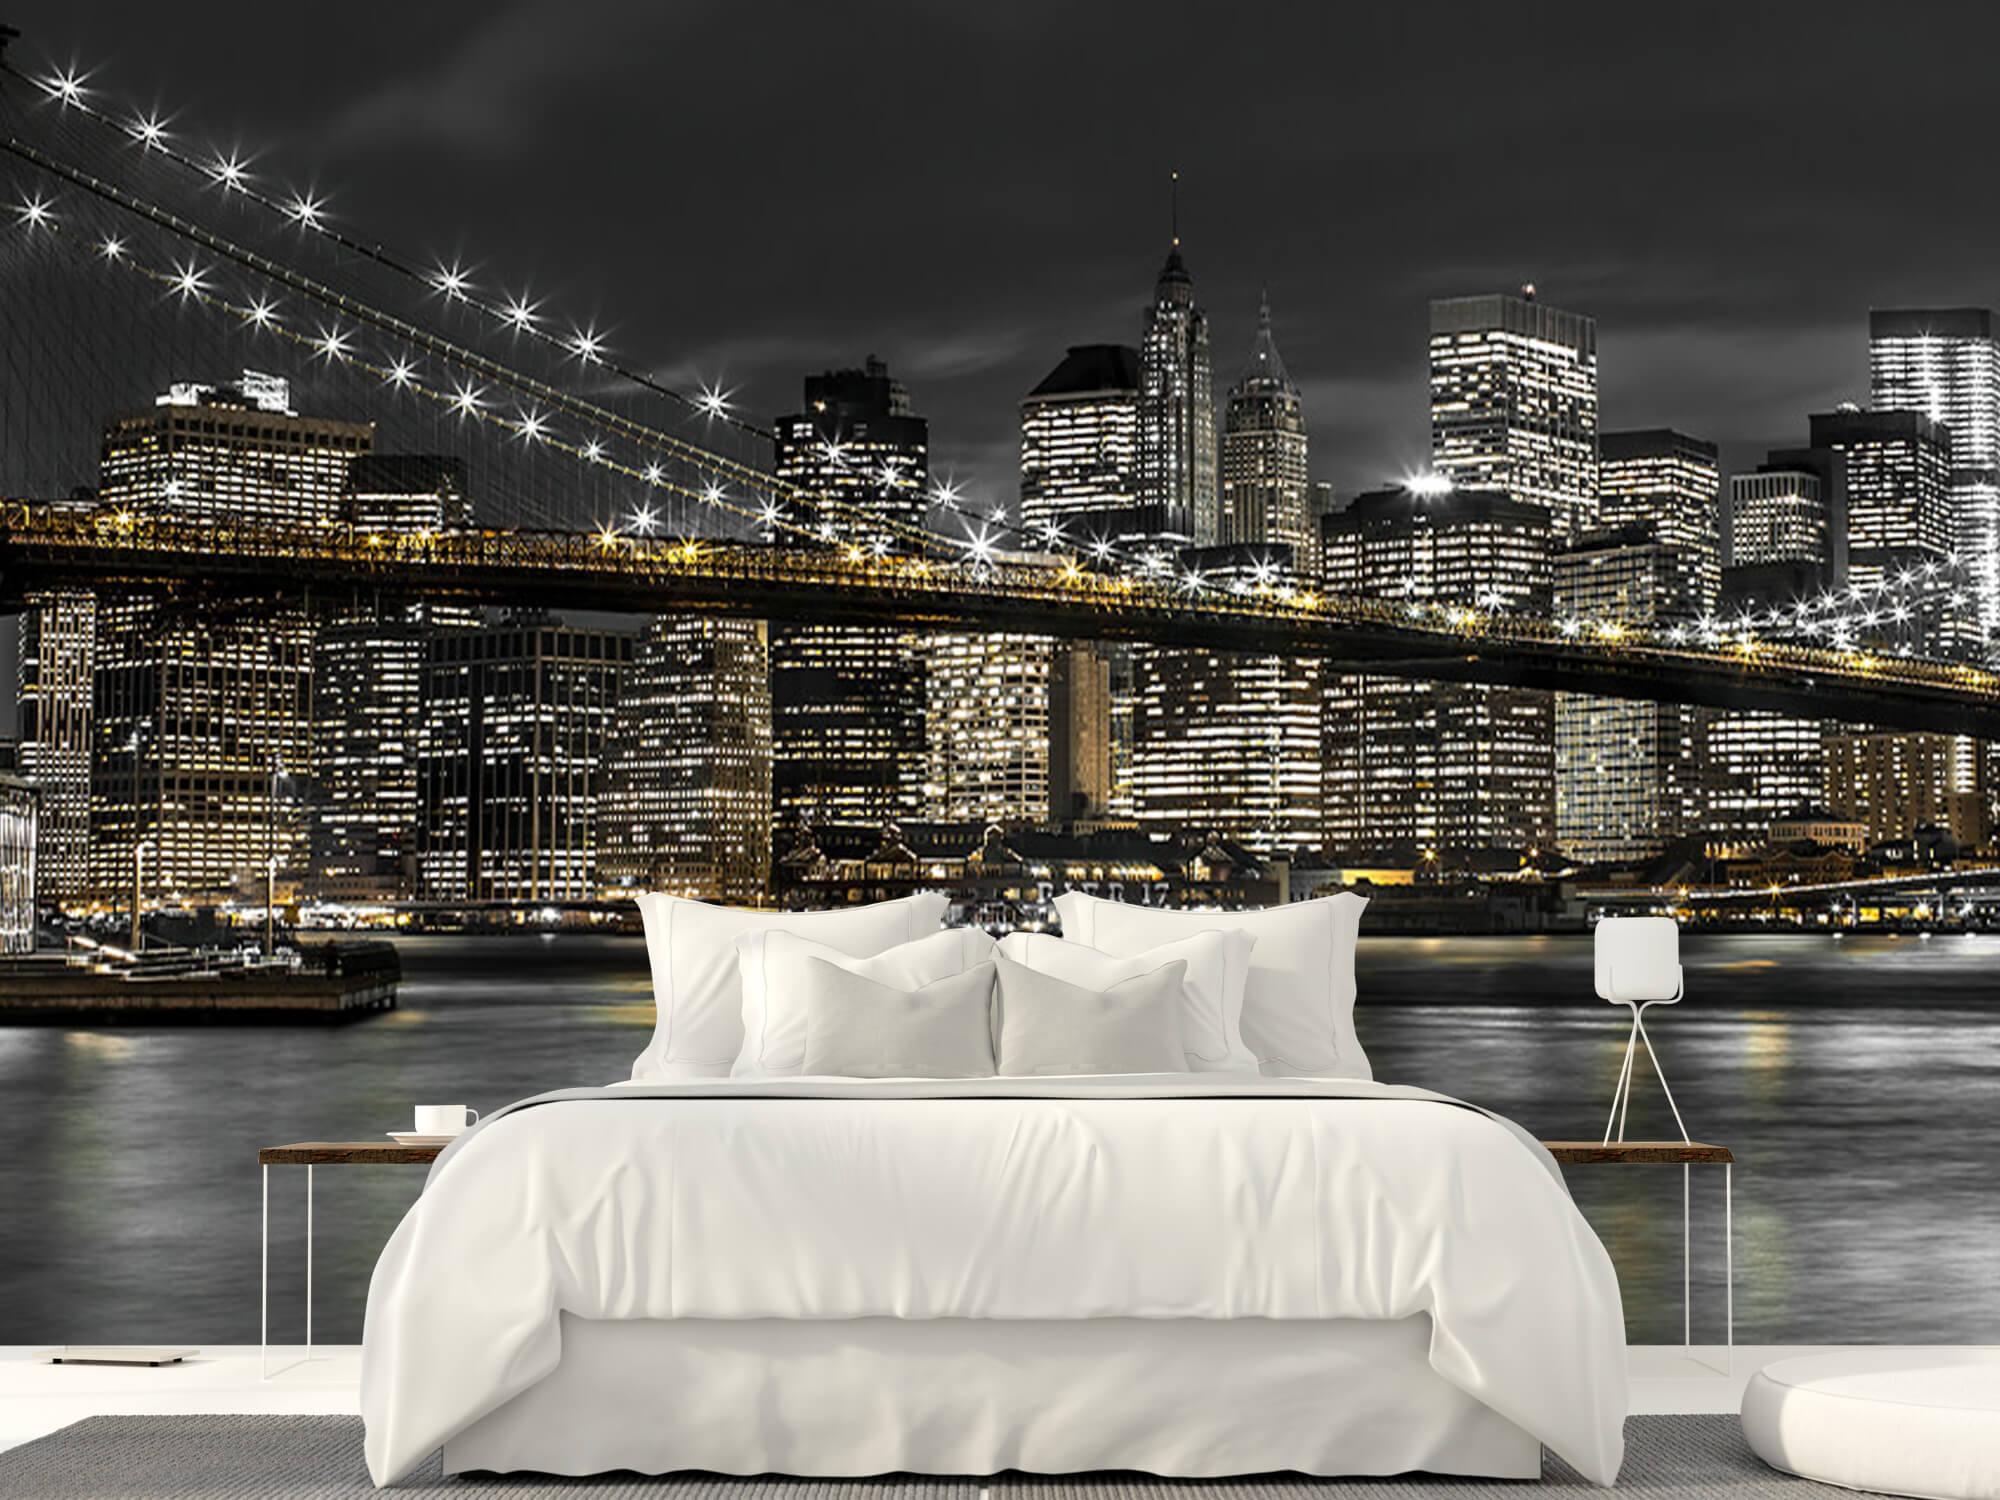 Brooklyn Bridge at Night 4